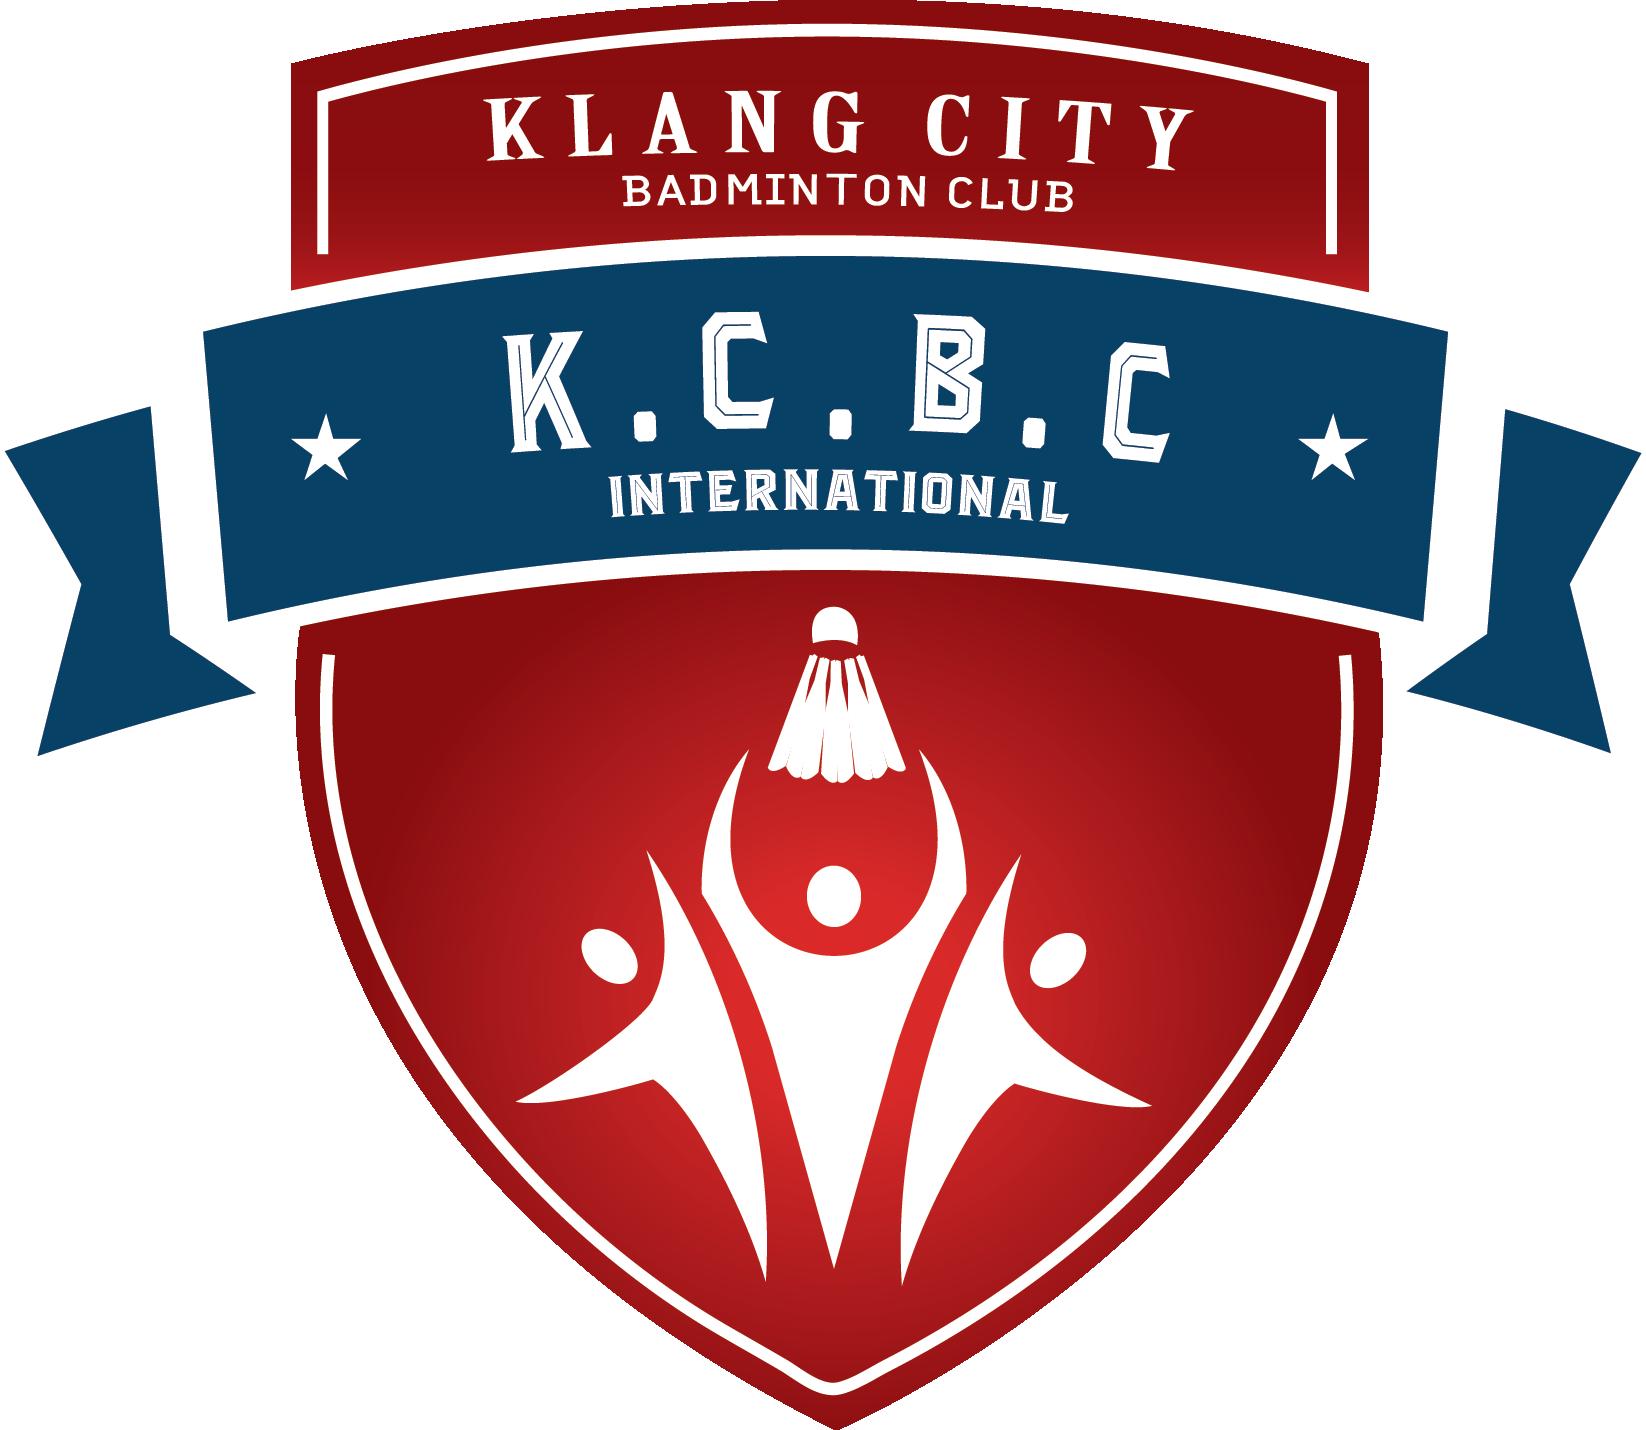 kcbc-logo-final-01